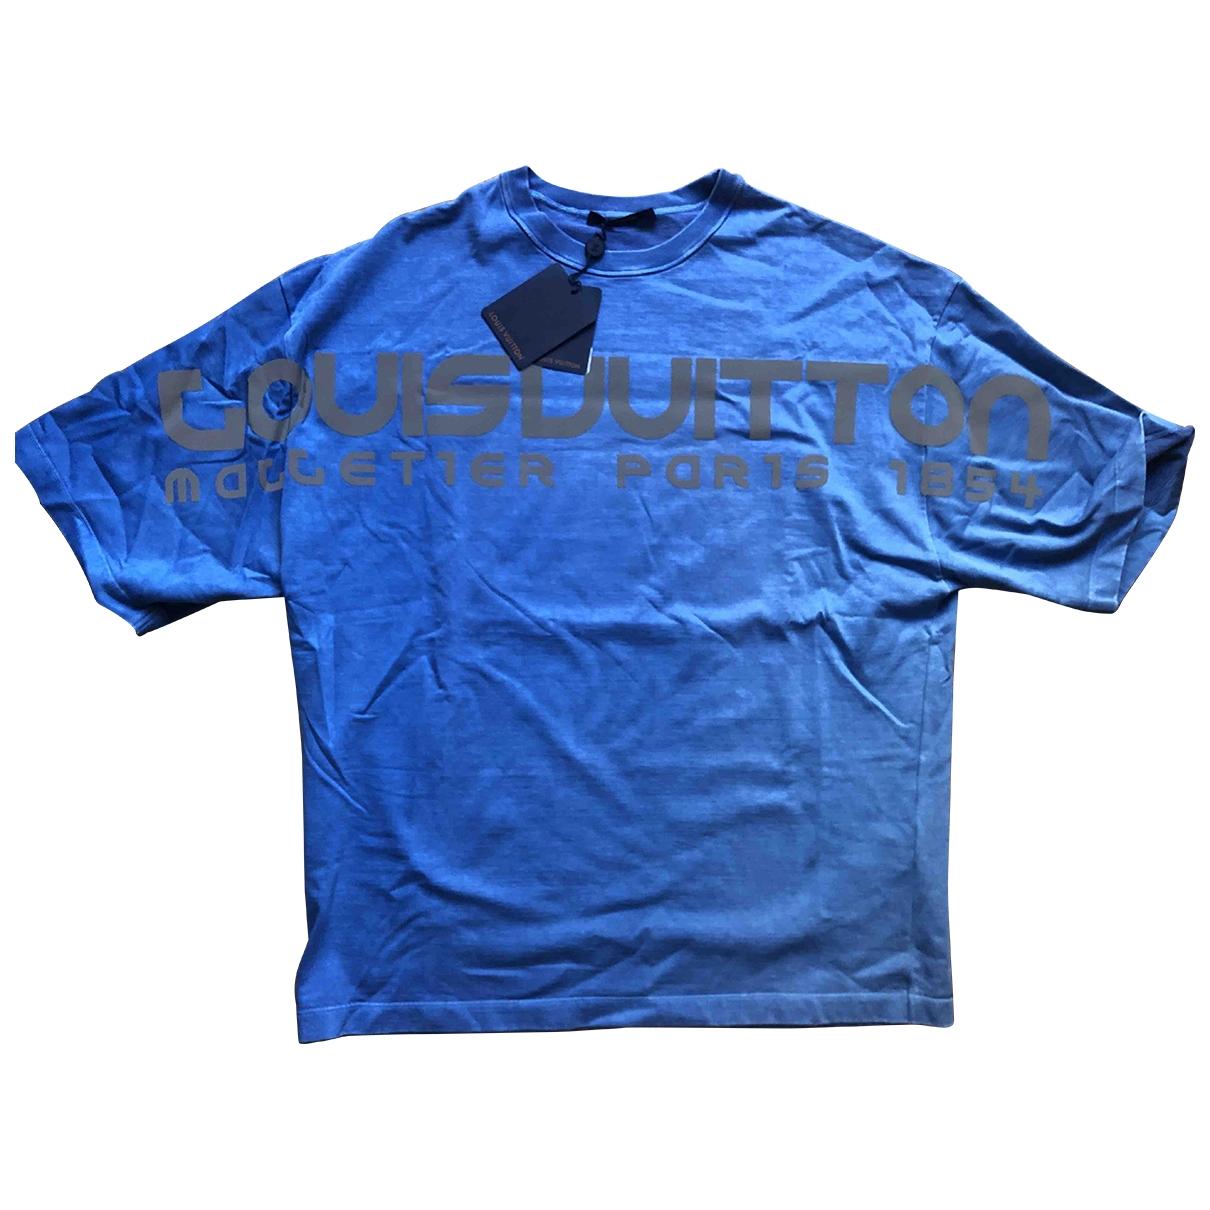 Louis Vuitton \N Blue Cotton Knitwear & Sweatshirts for Men S International